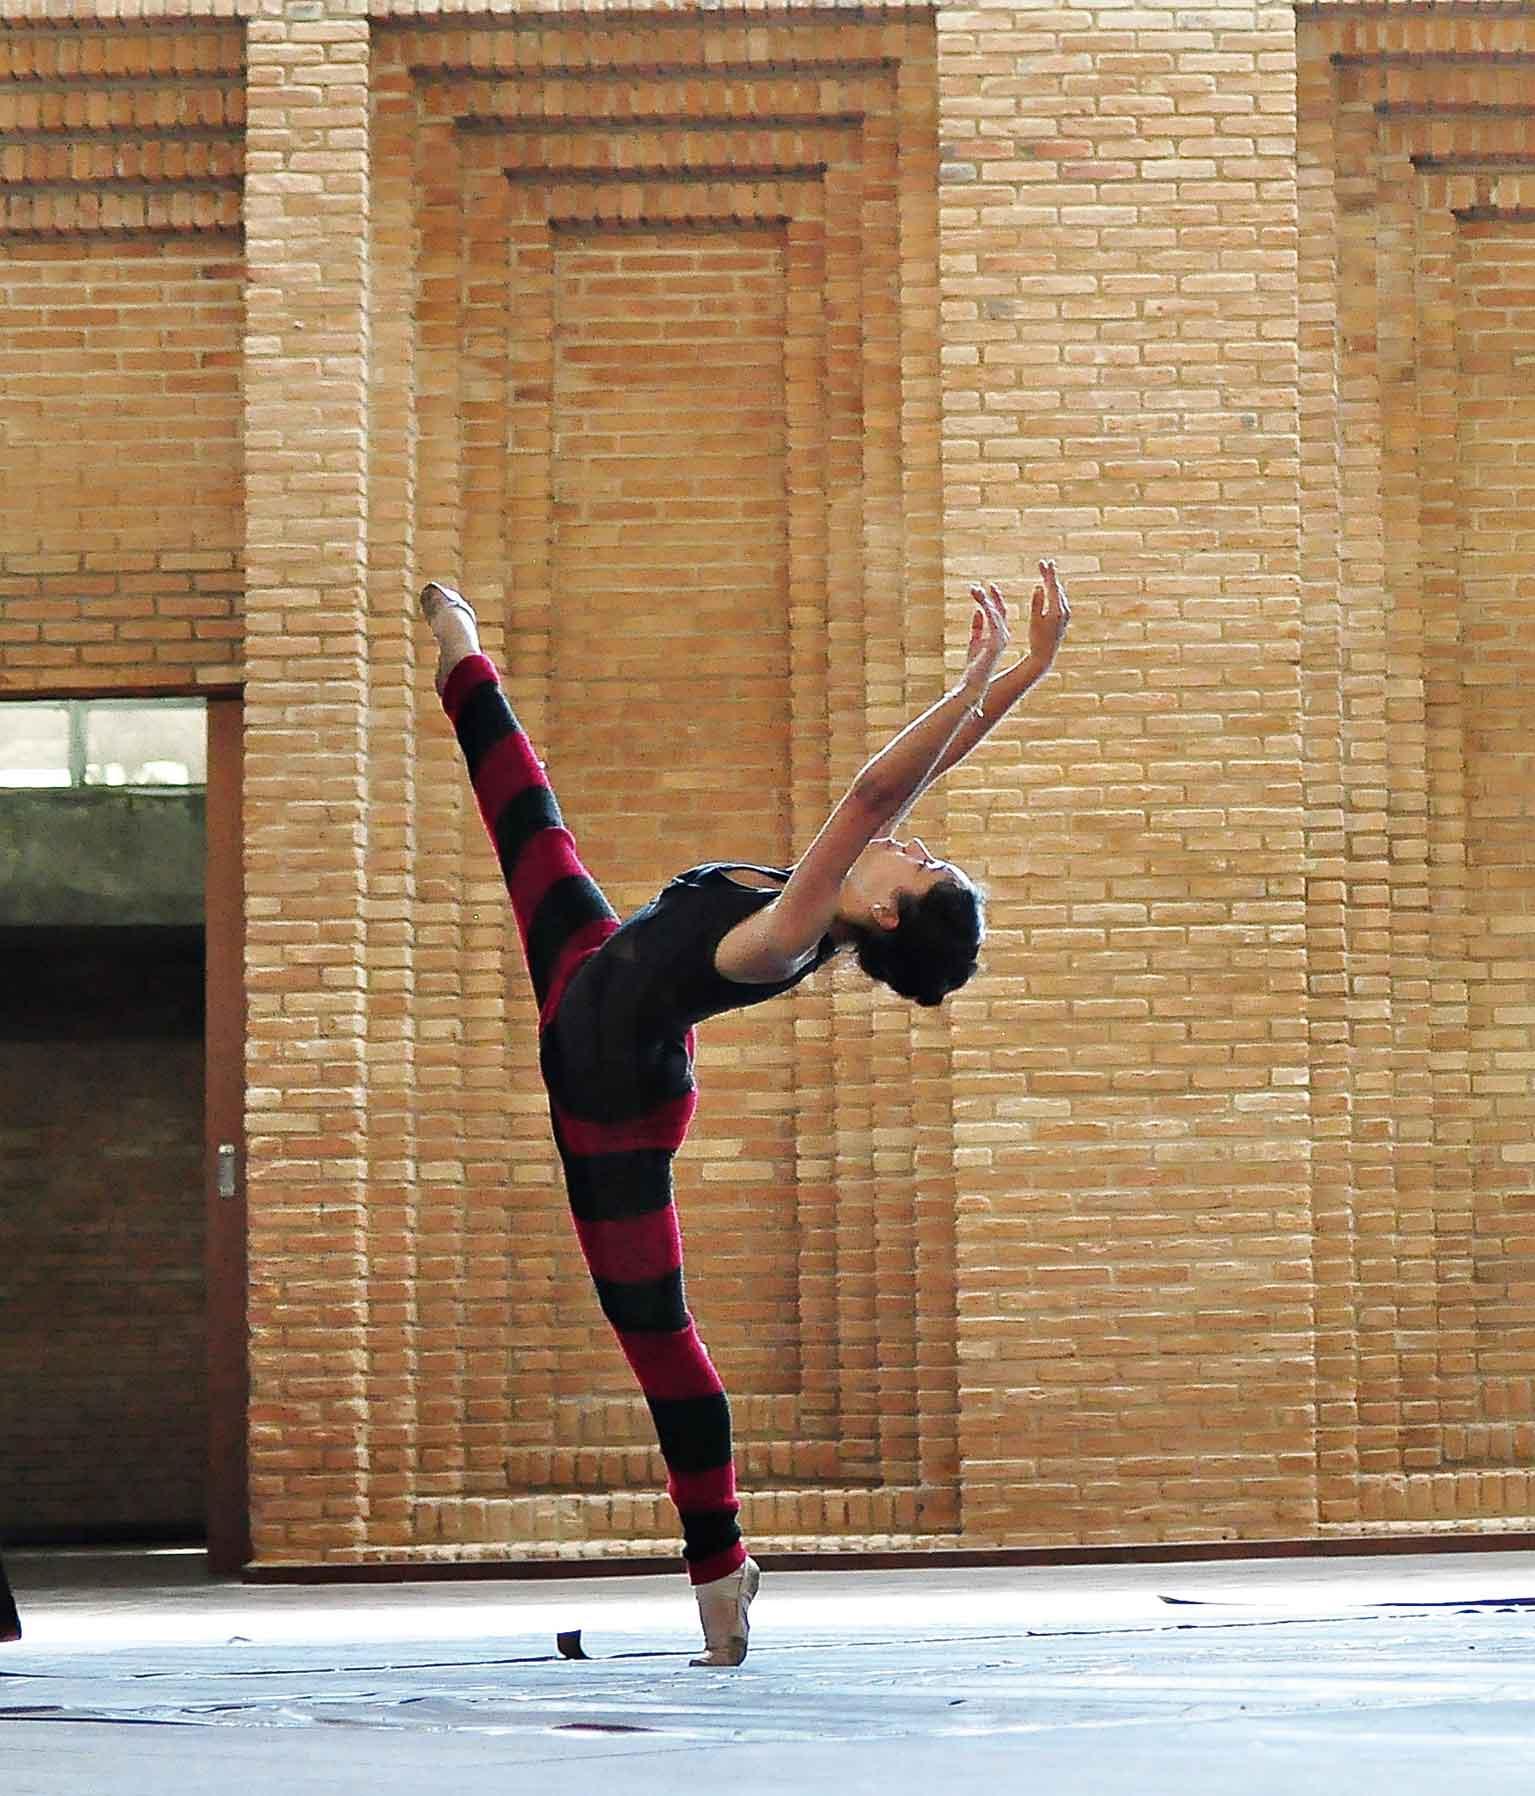 Campos-do-Jordao-Artes-Vanessa-Ballet-bx